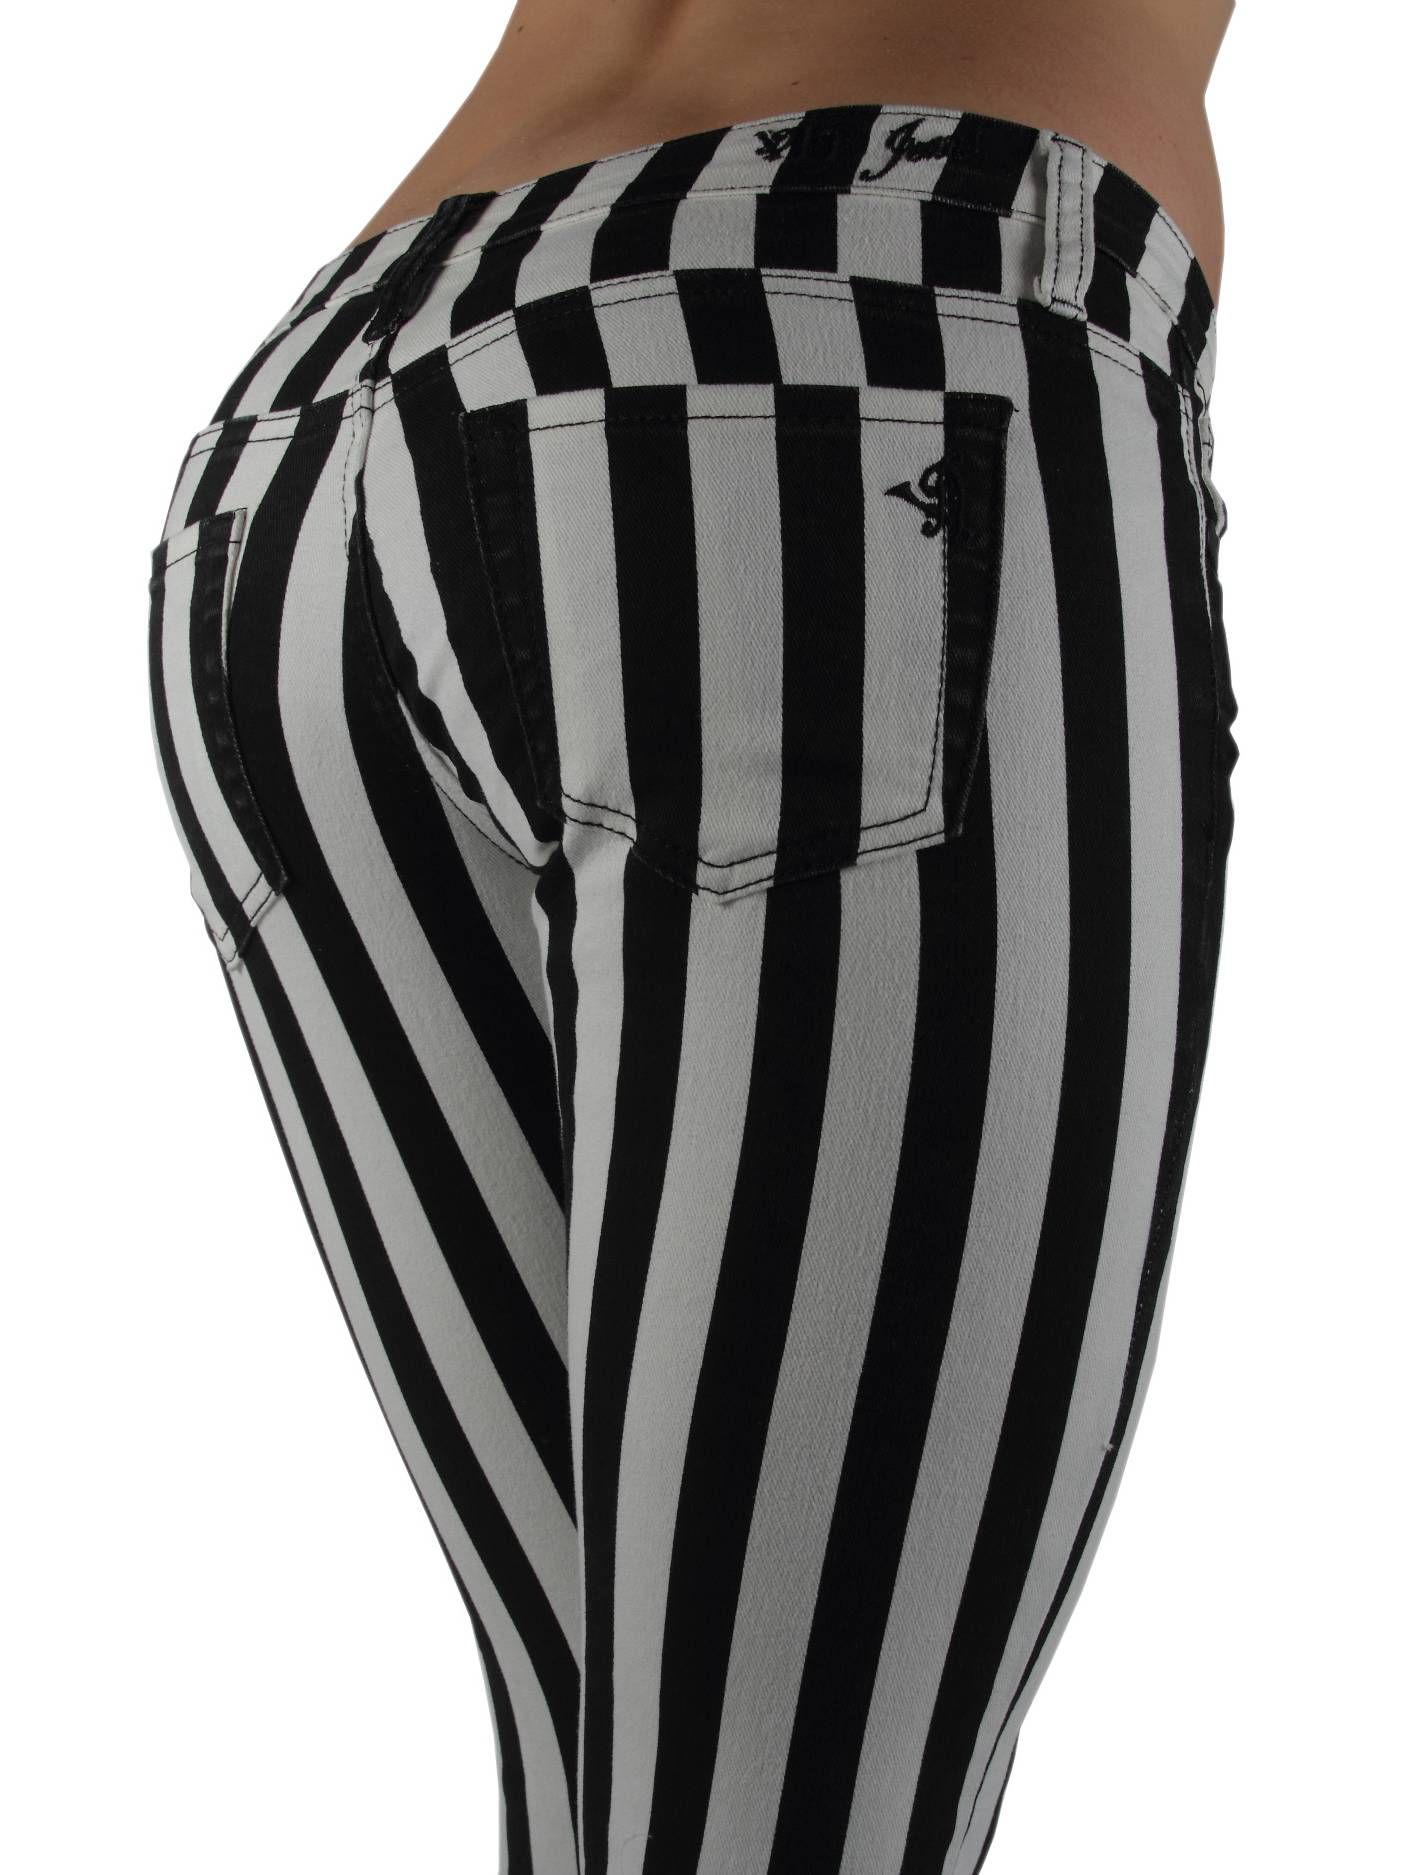 Black & White Striped 5 Pockets Classic Skinny Jeans